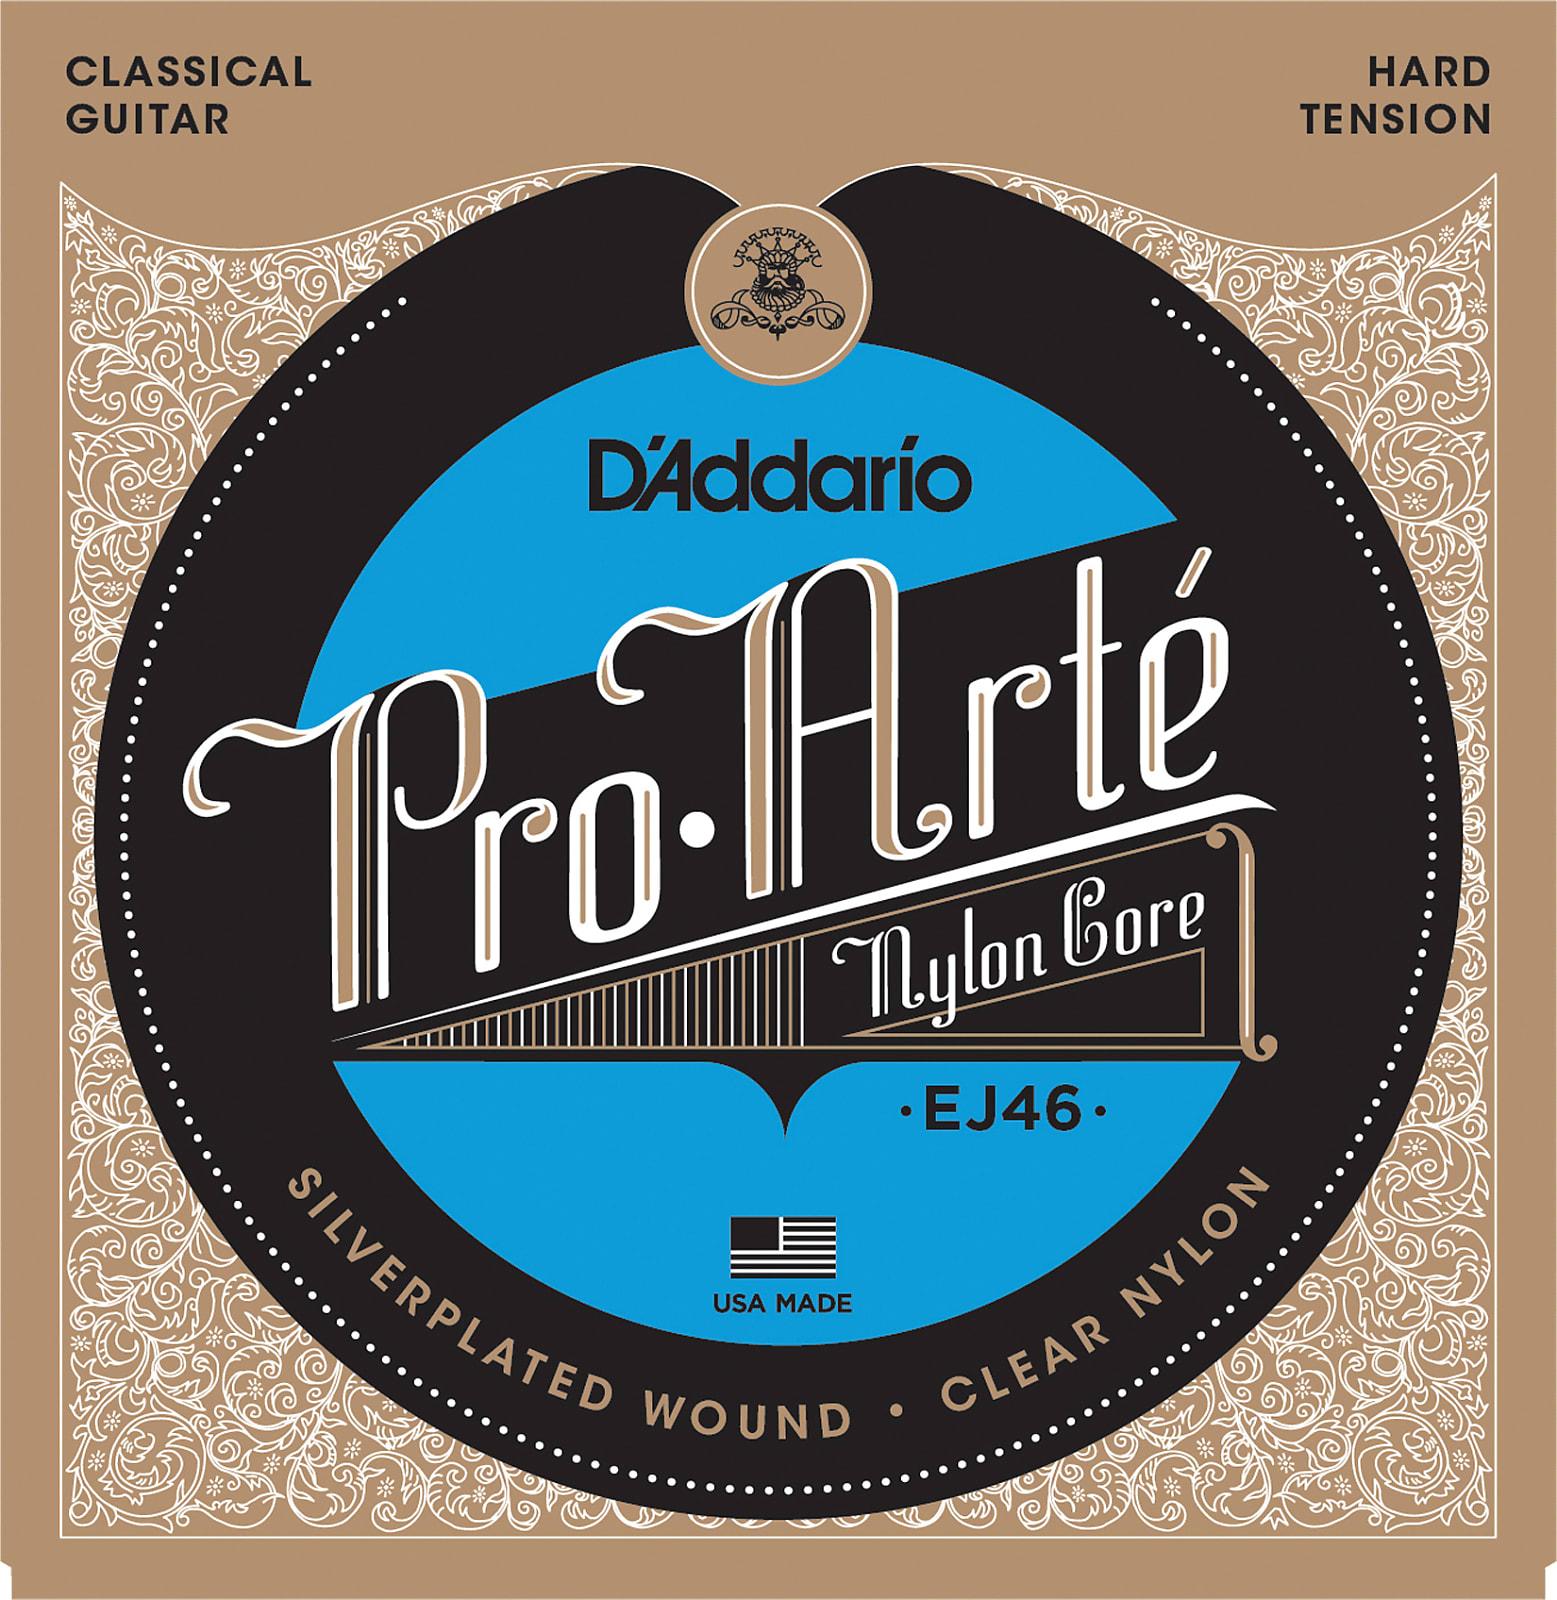 D'Addario EJ46 Pro-Arte Nylon Classical Guitar Strings, Hard Tension